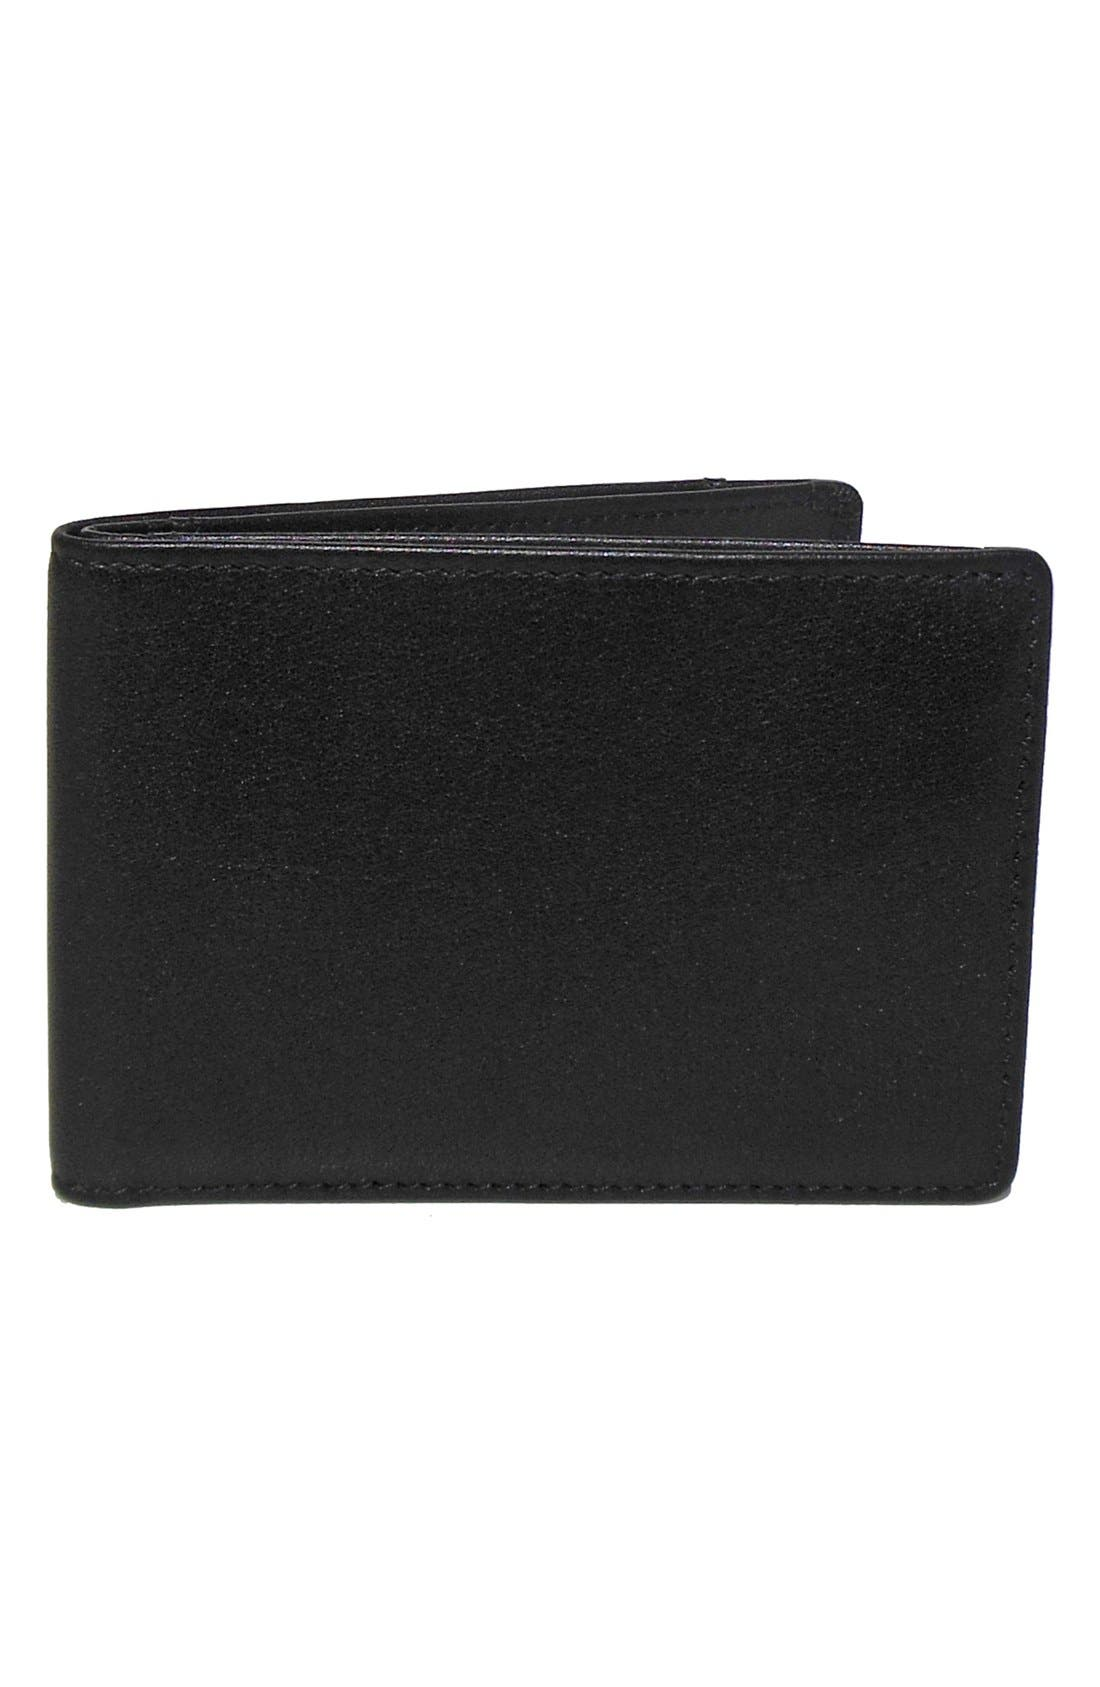 'Grant Slimster' RFID Blocker Leather Wallet,                             Main thumbnail 1, color,